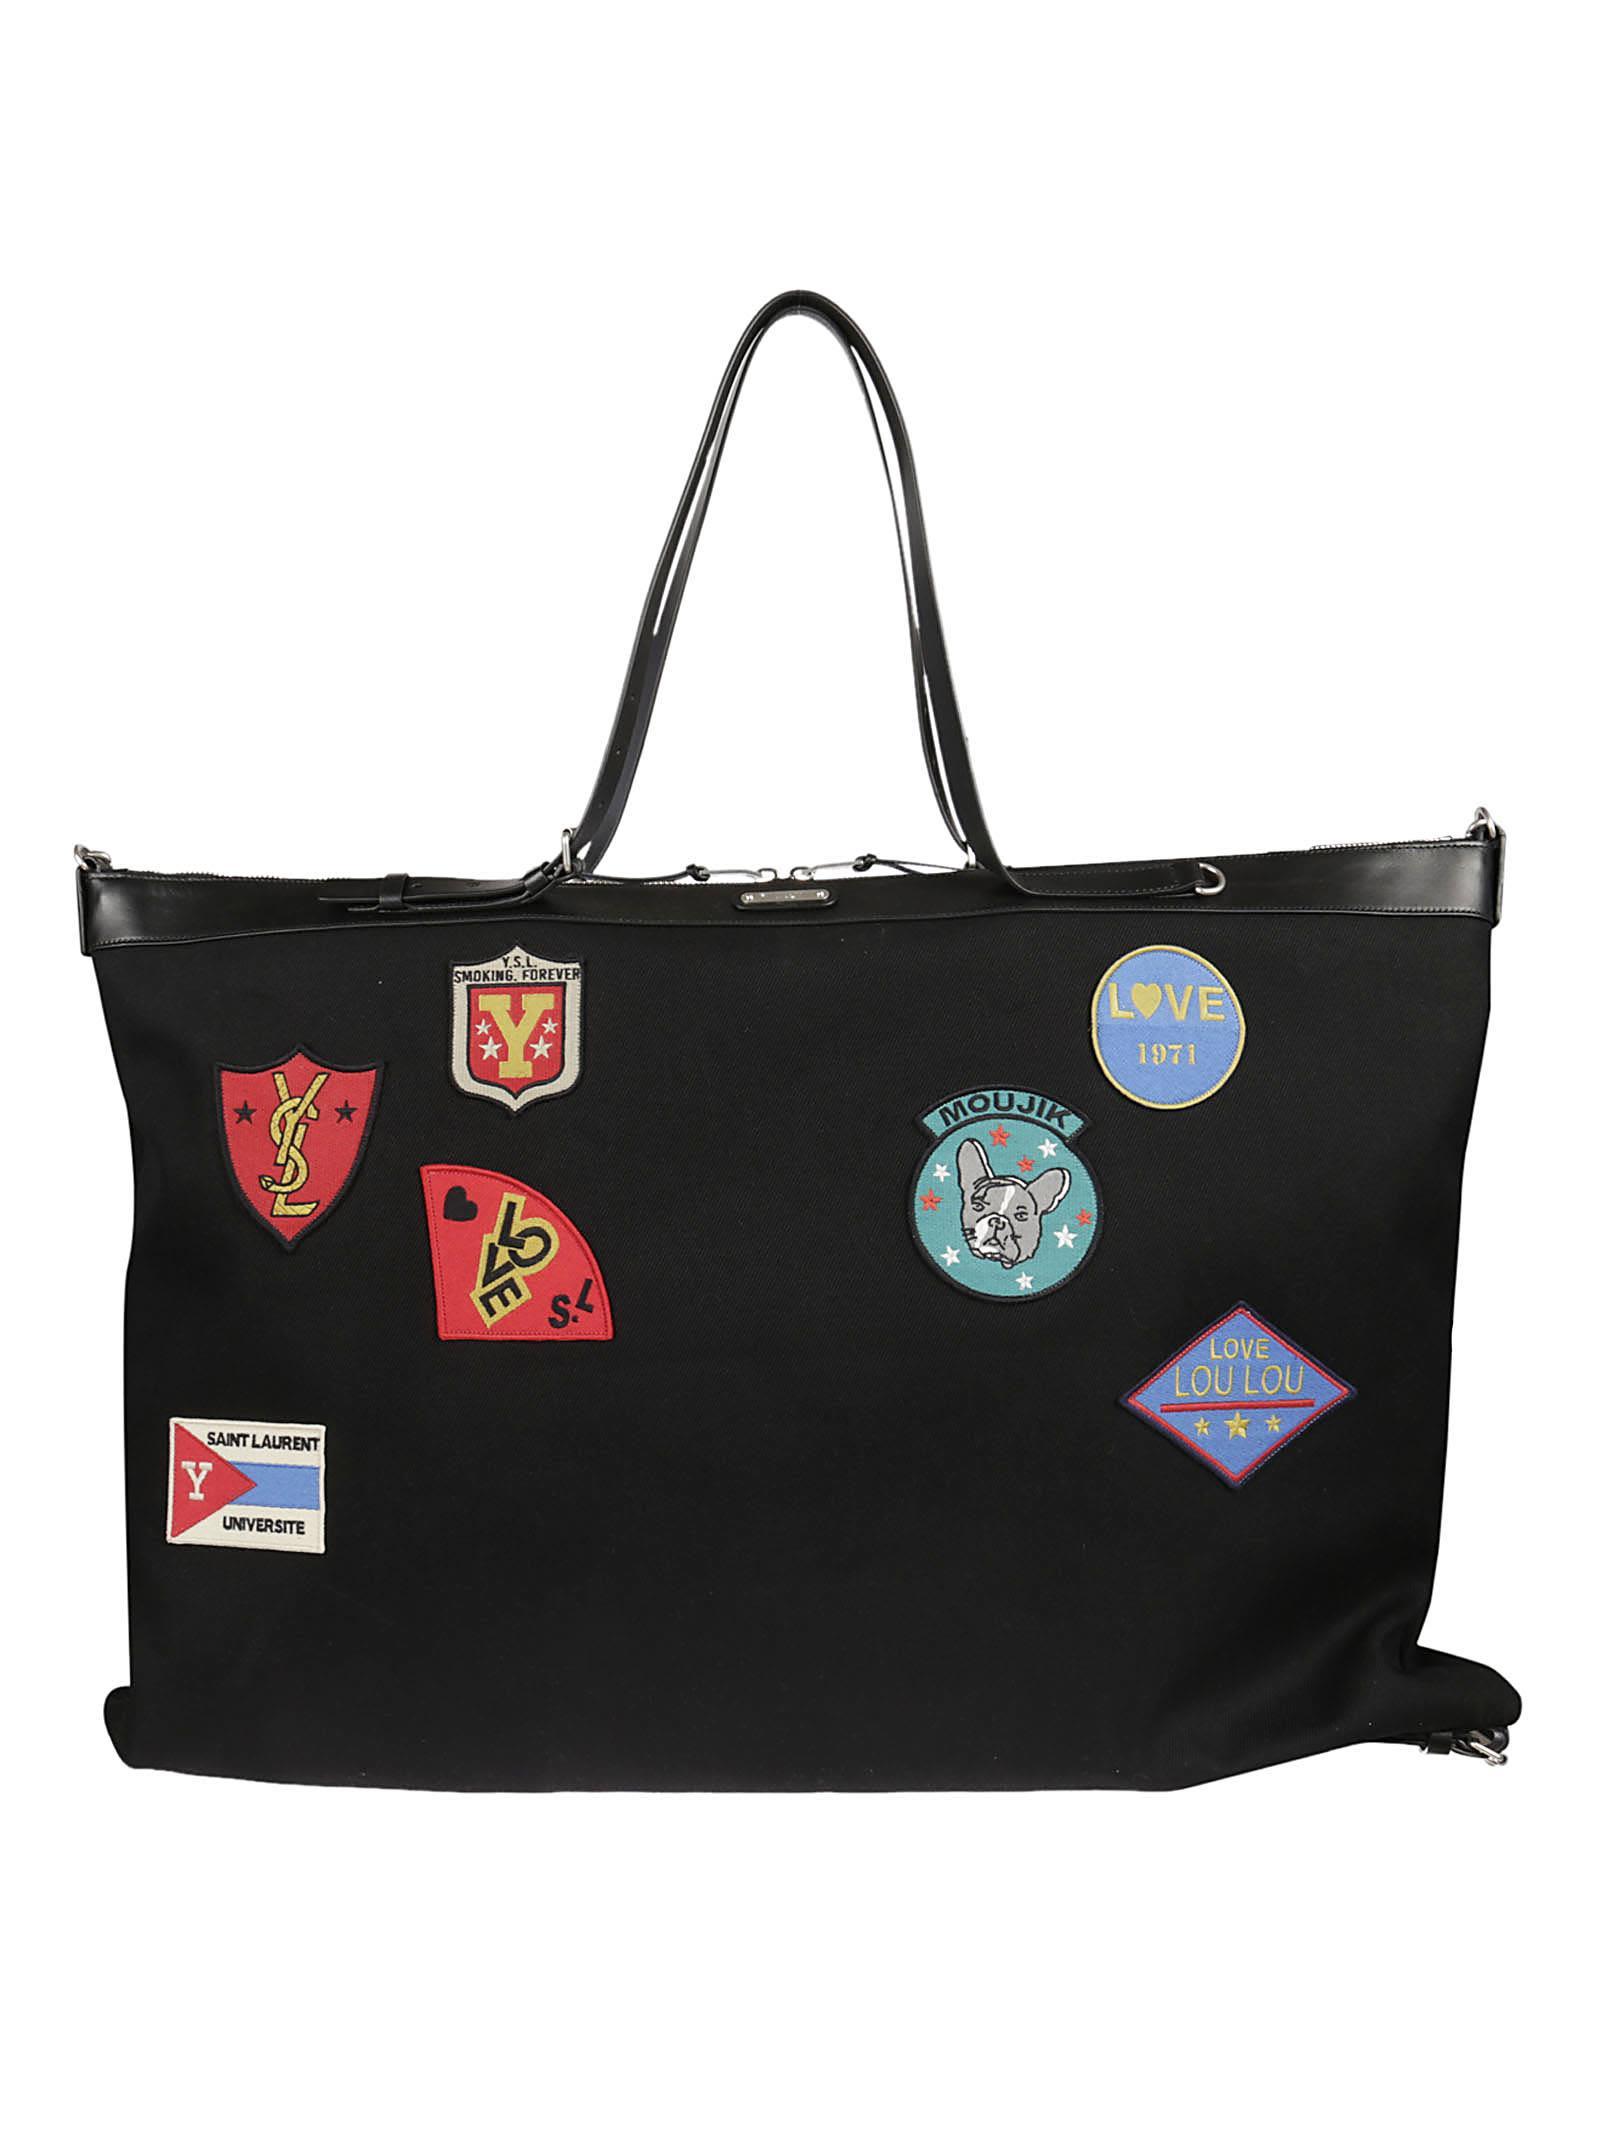 Saint Laurent Convertible Hobo Bag